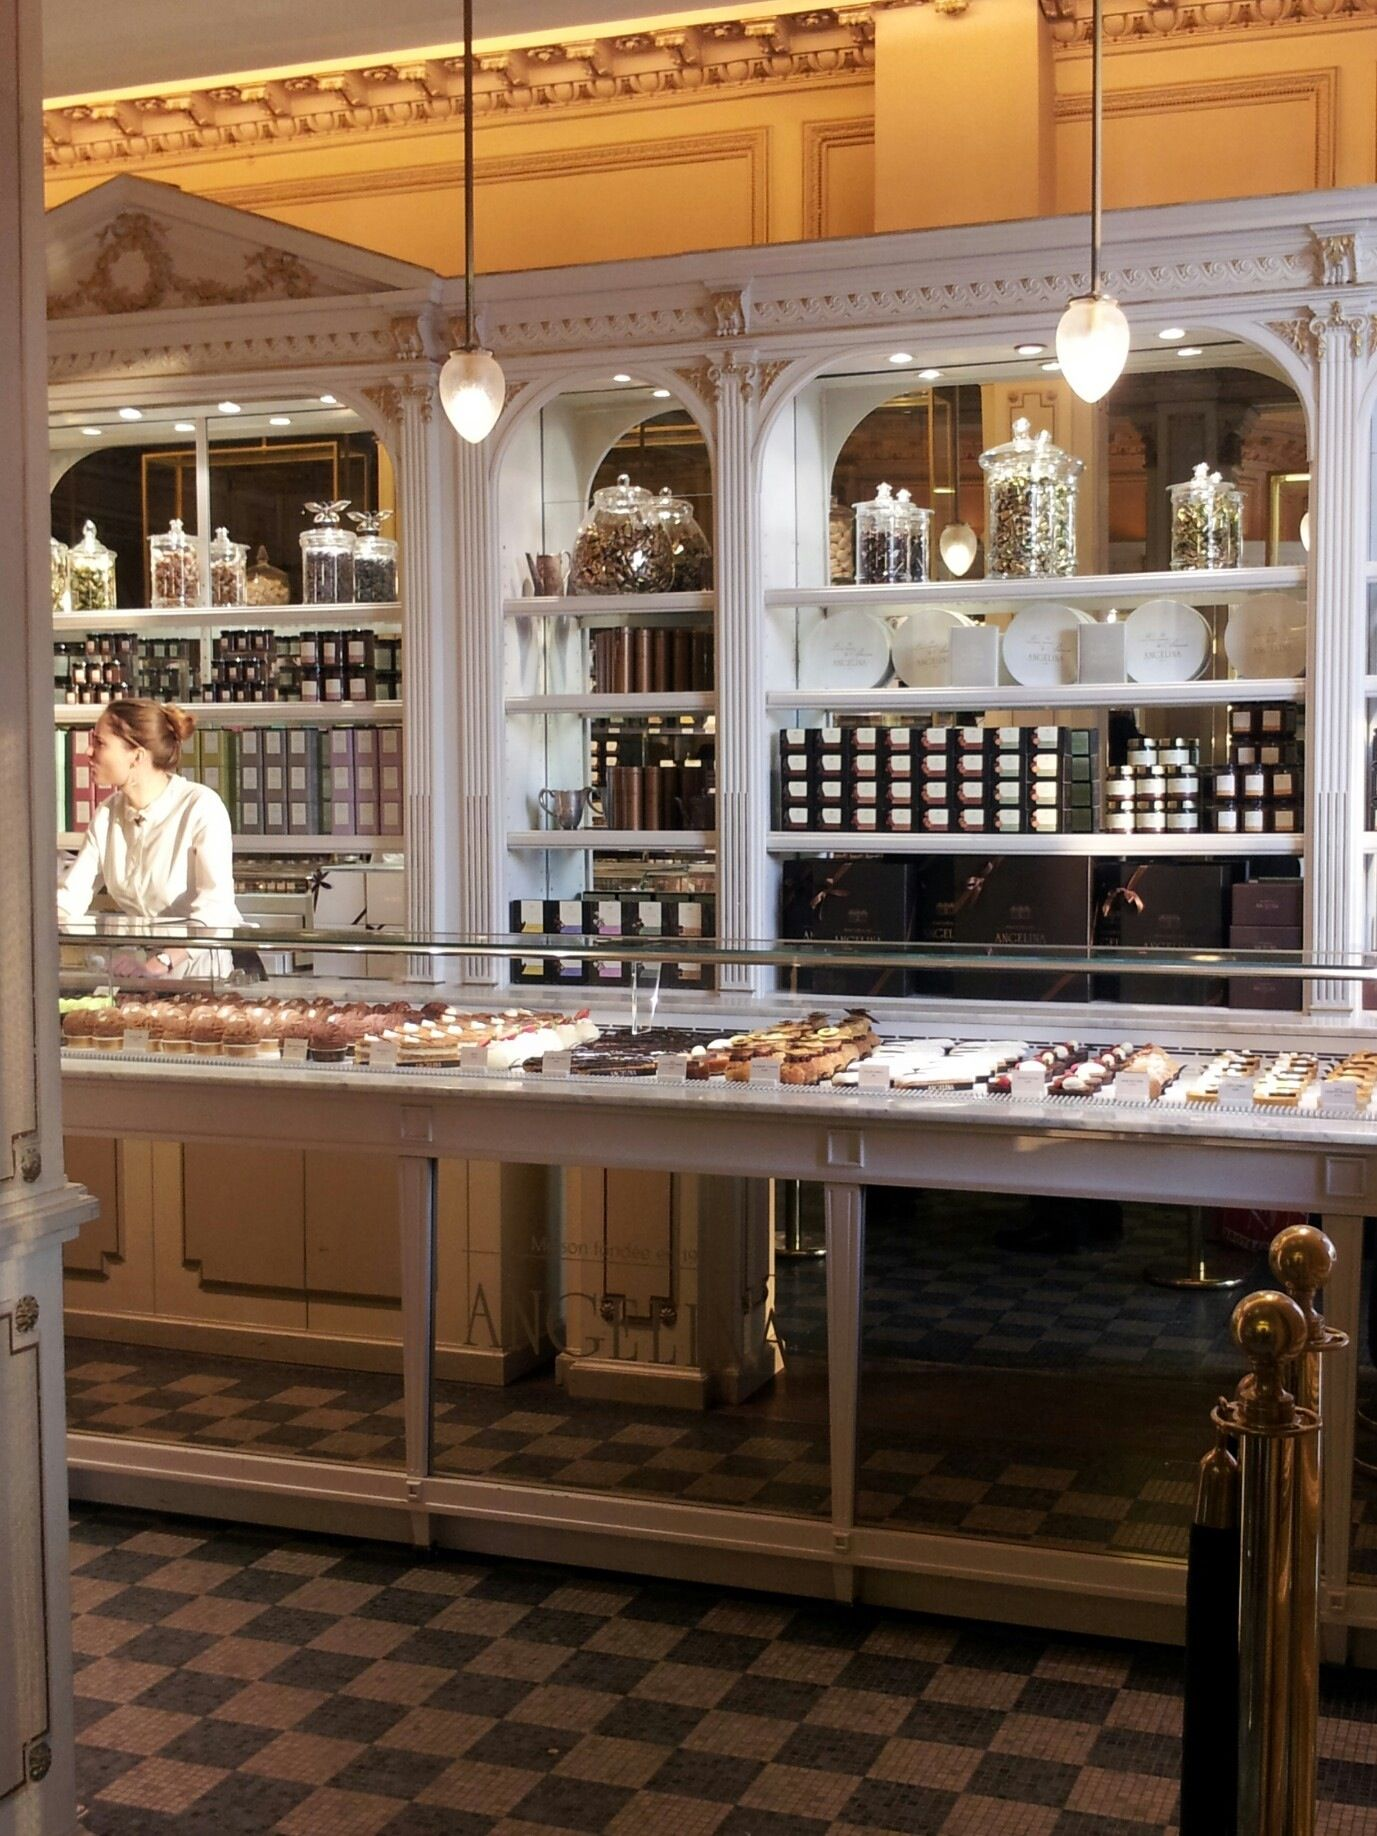 Angelina, Rue de Rivoli --Best hot chocolate in the world (like melted chocolate bars)